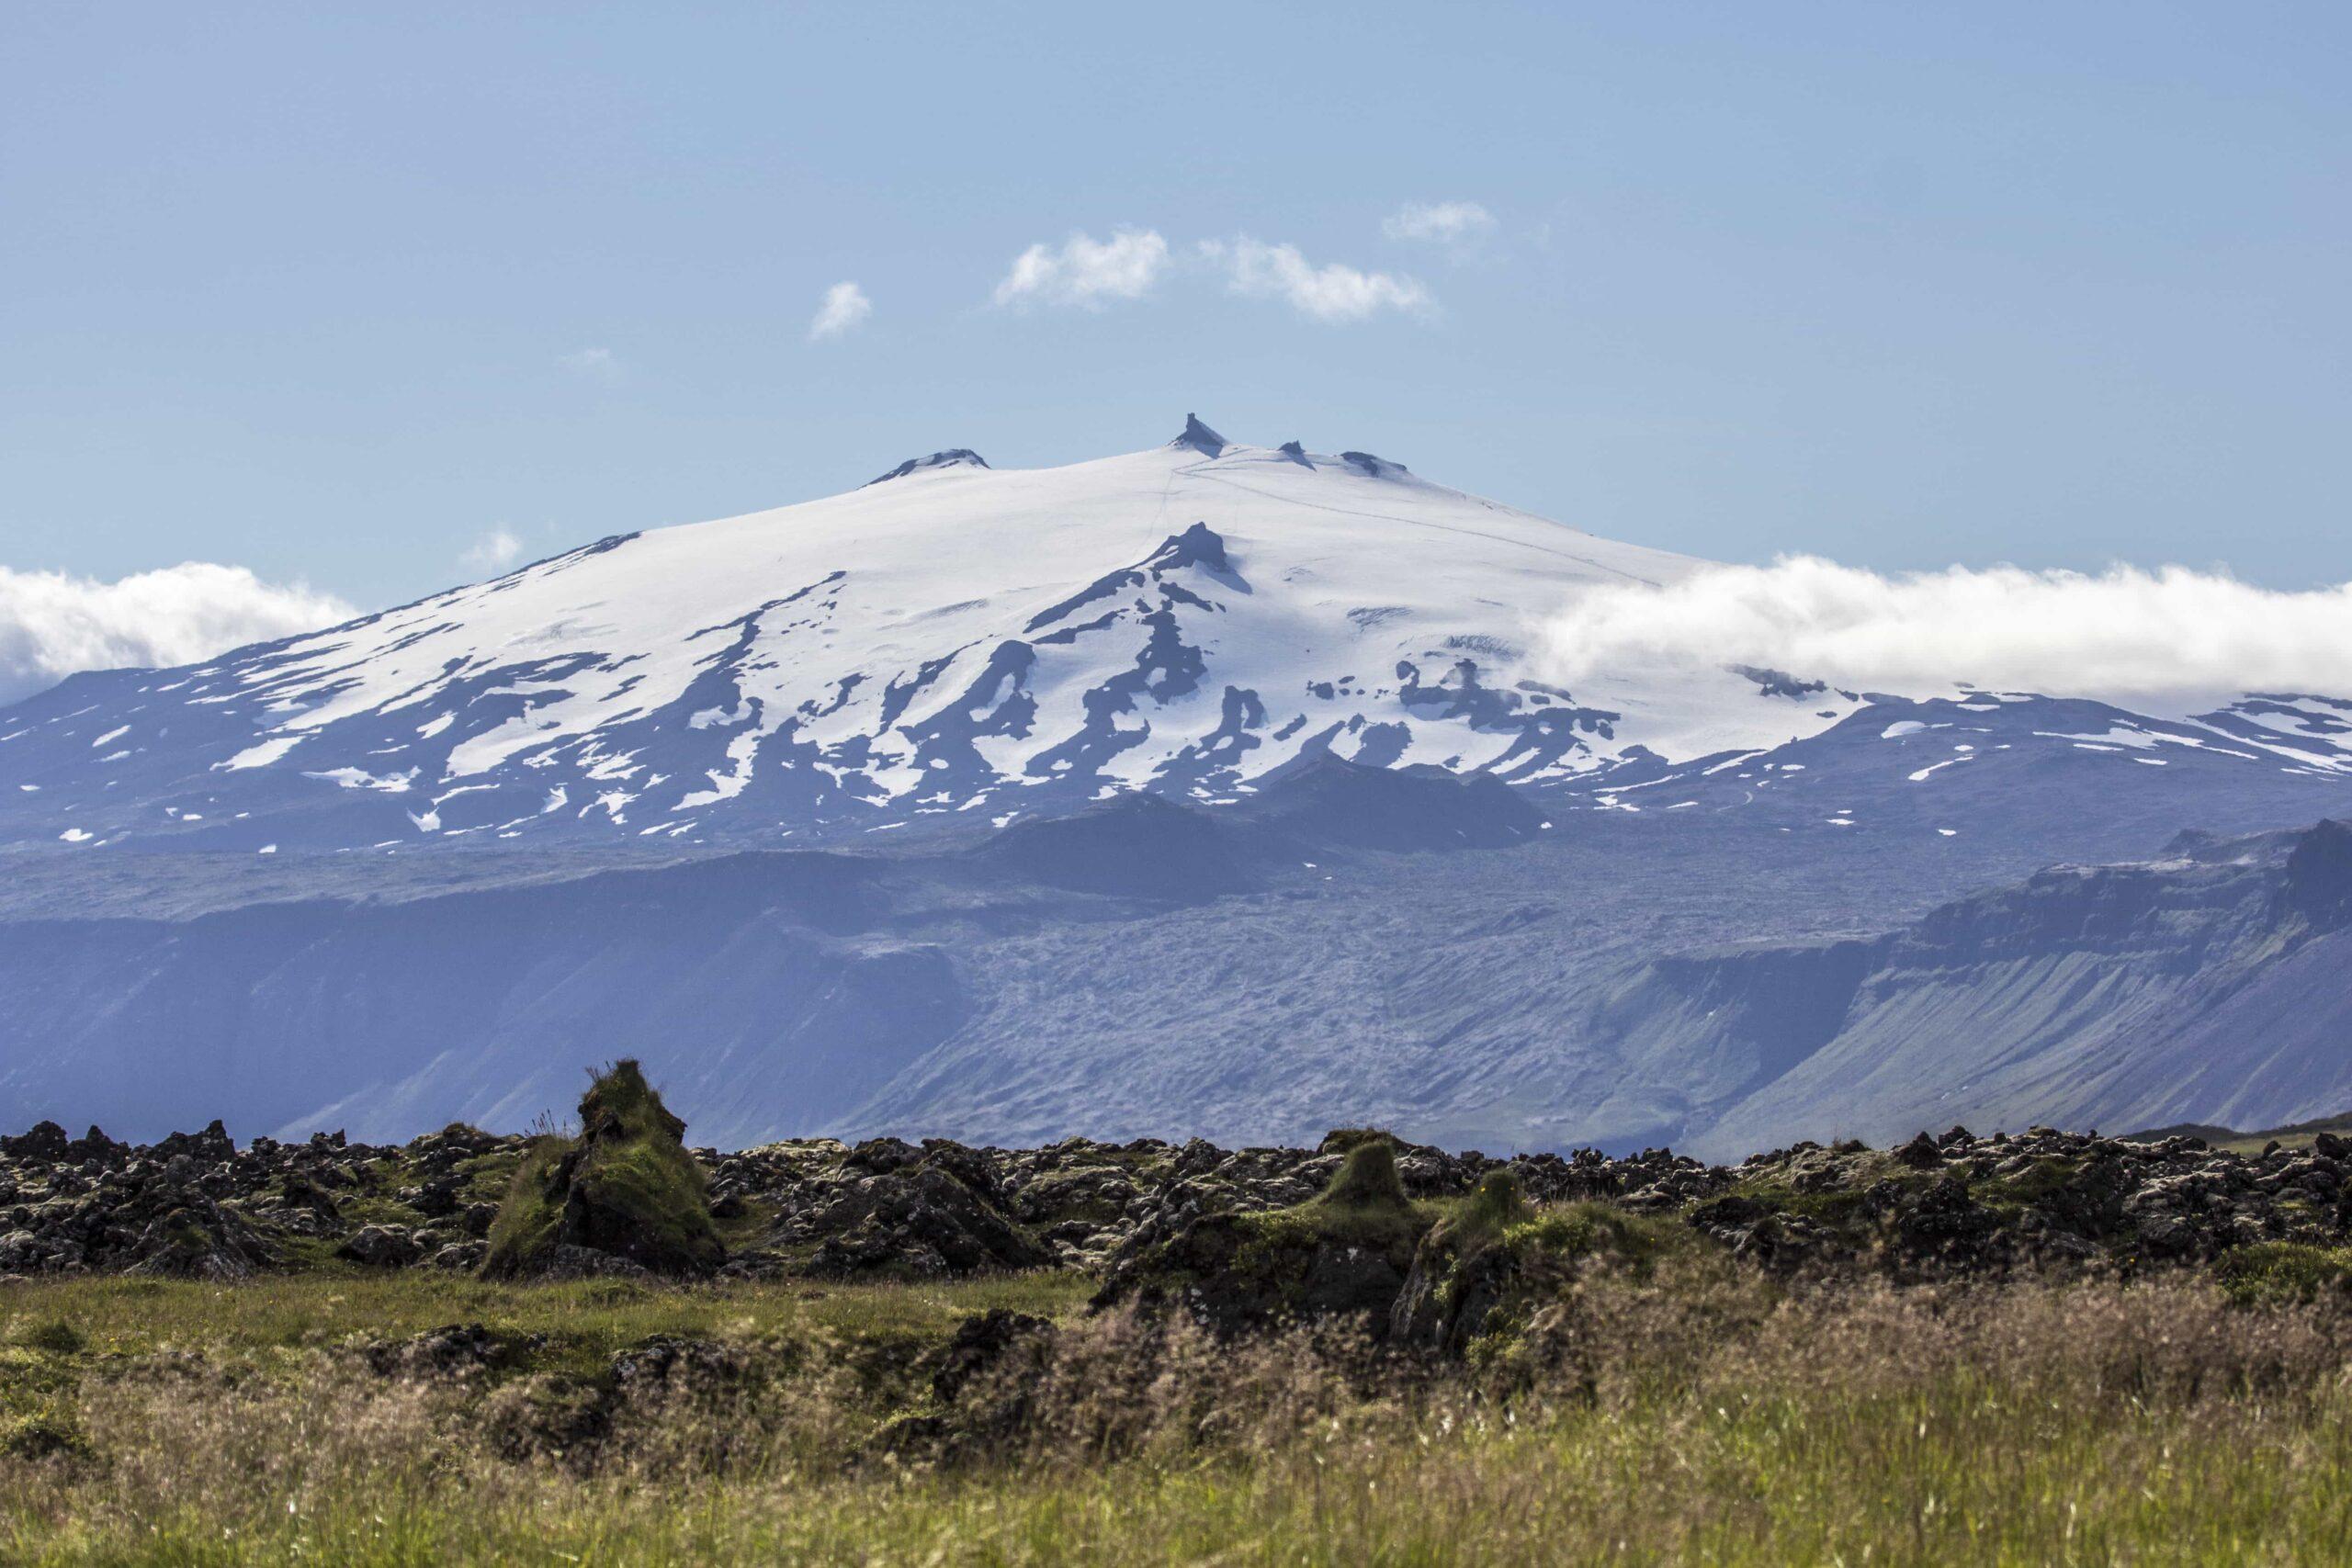 Snæfellsjokull glacier - Snæfellsnes Peninsula